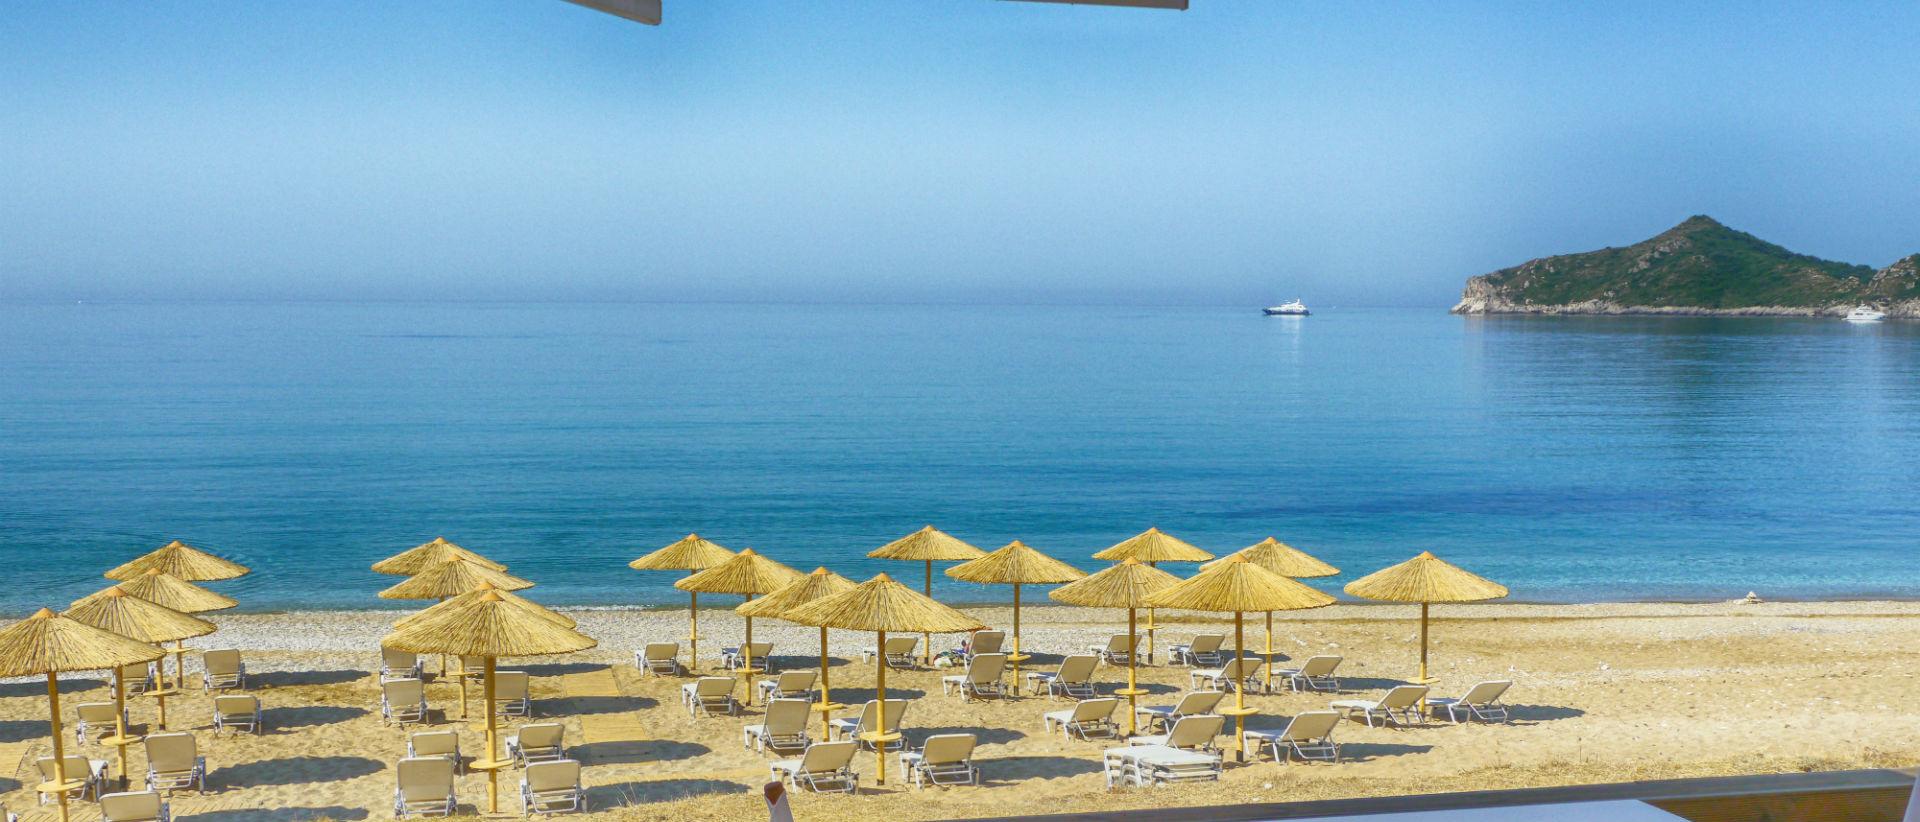 H παραλία Αγίου Γεωργίου Πάγων θεωρείται ως η ομορφότερη του νησιού.